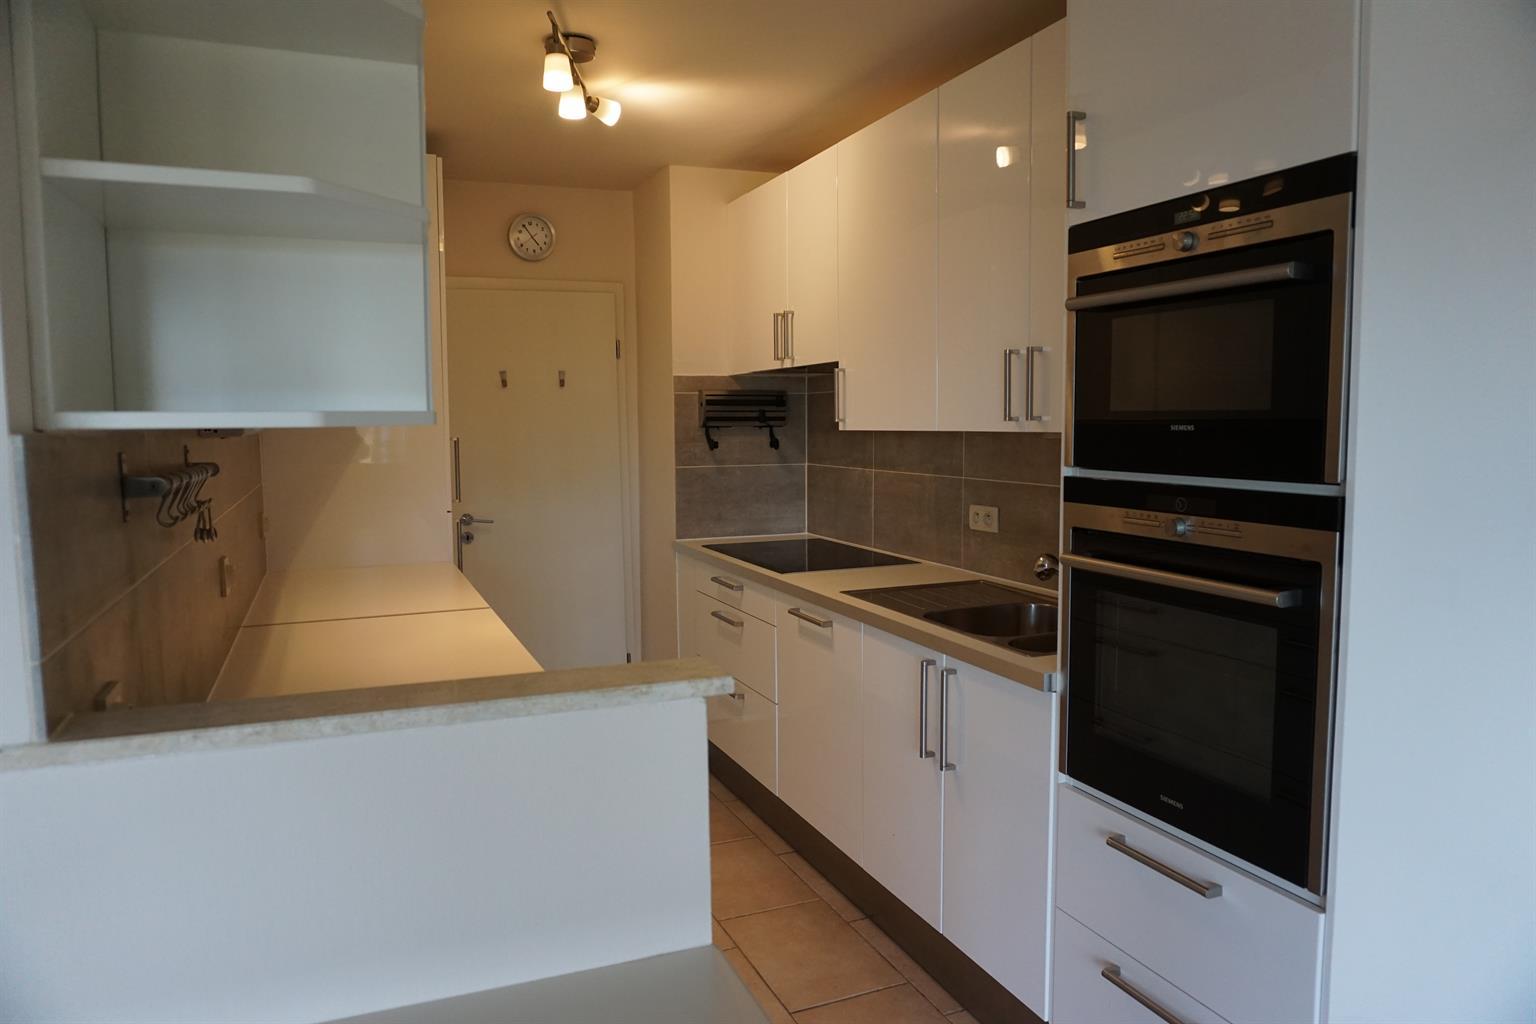 Appartement - Nivelles - #3966573-3